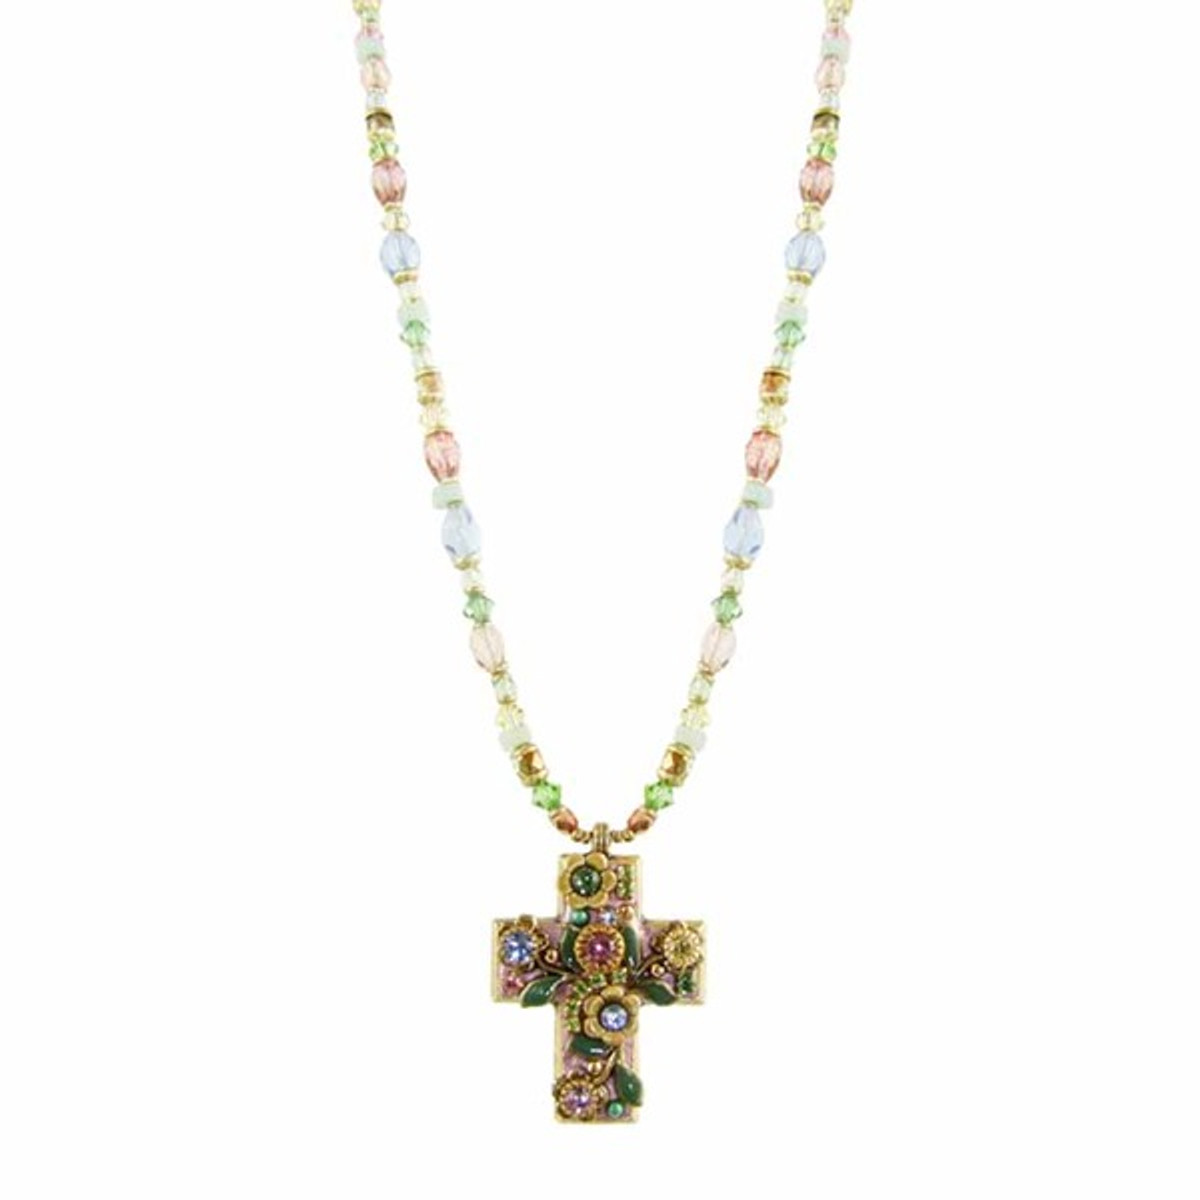 Small Rosy Garden Cross Necklace